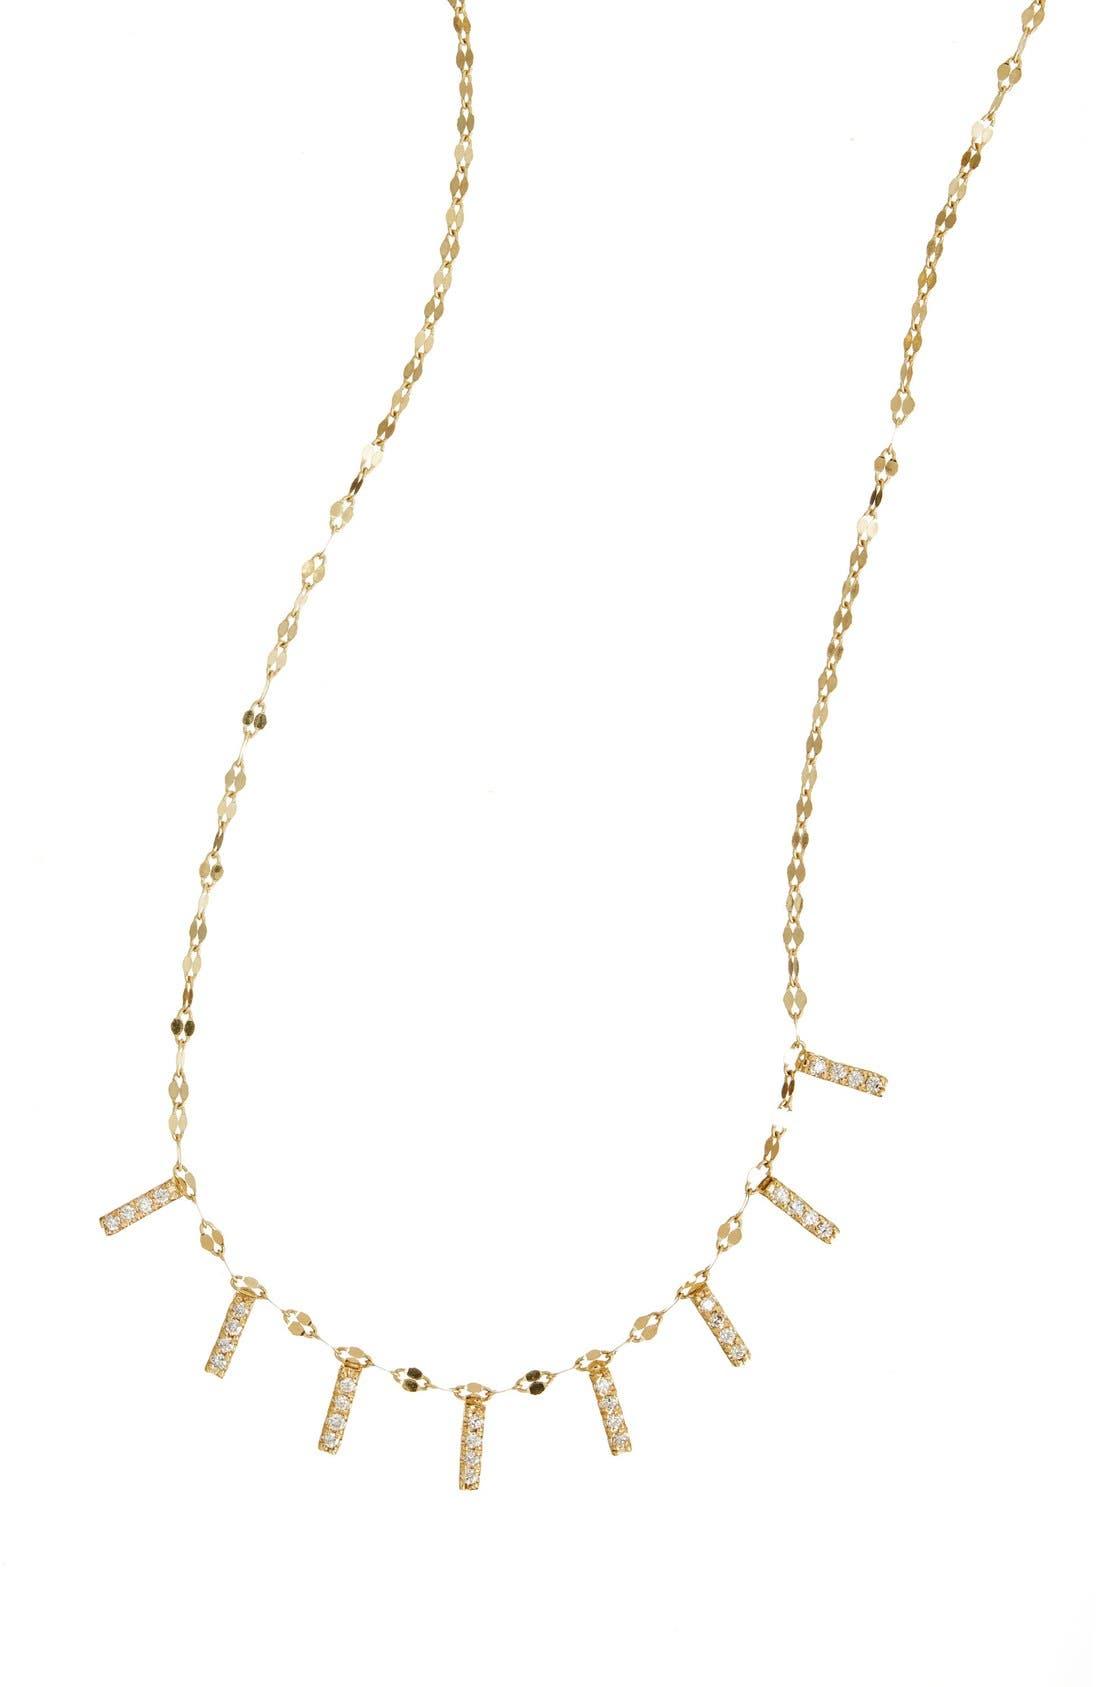 'Flawless' Mini Bar Collar Necklace,                             Main thumbnail 1, color,                             YELLOW GOLD